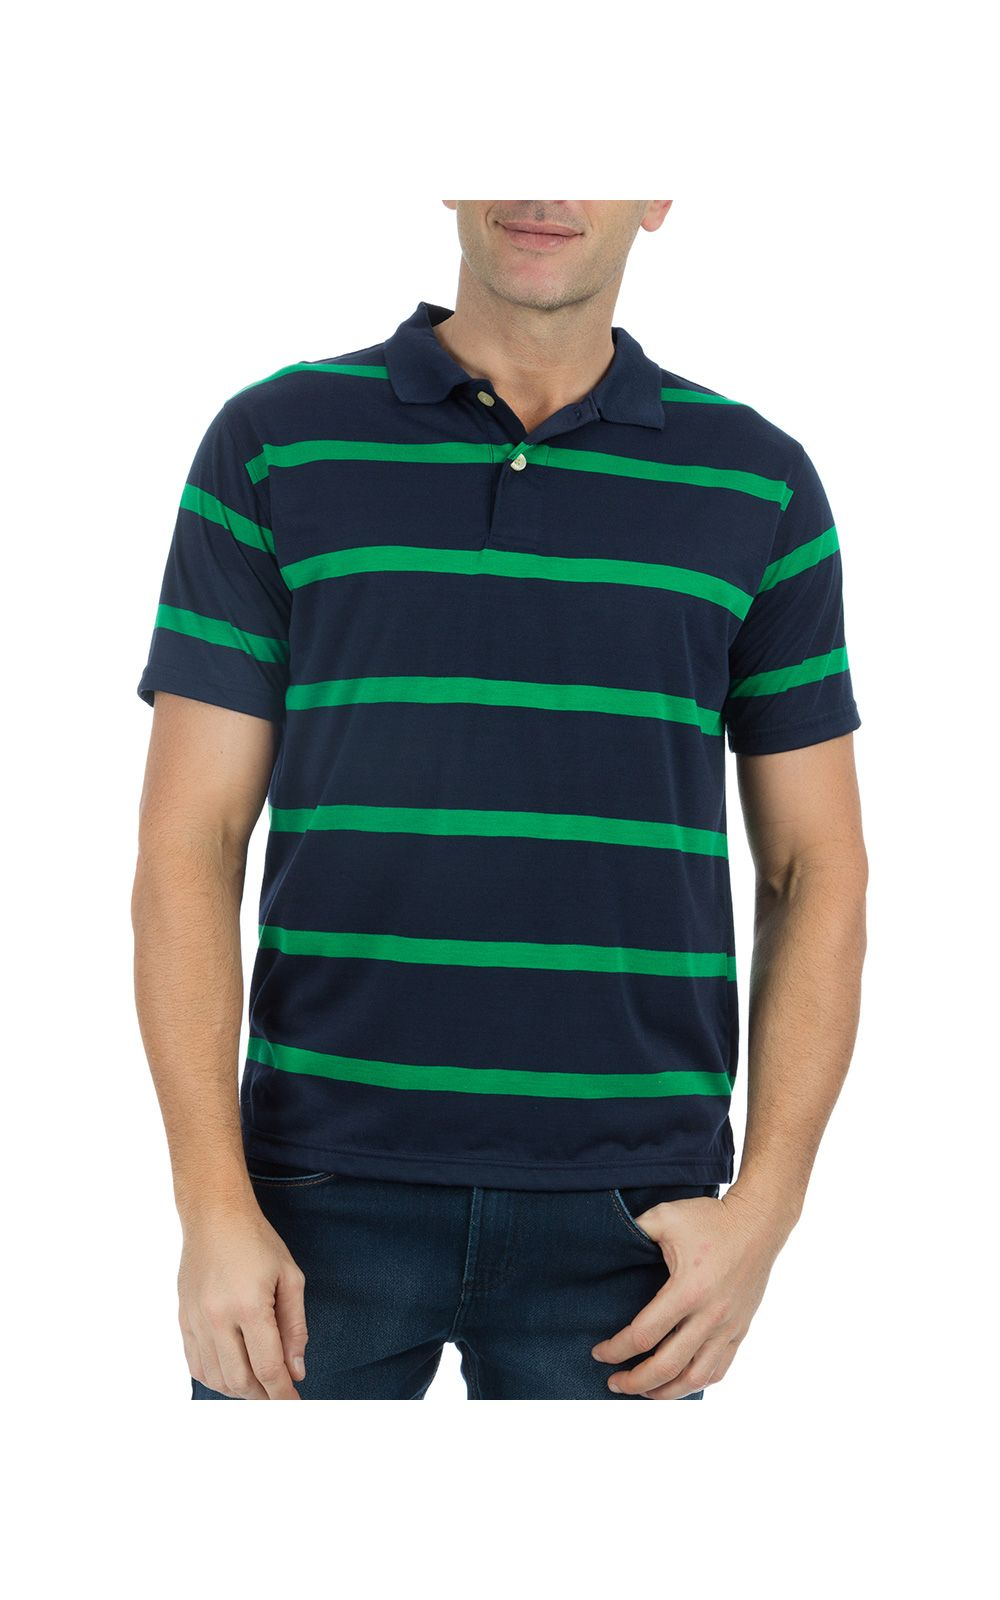 Foto 1 - Camisa Polo Masculina Azul Marinho Listrada